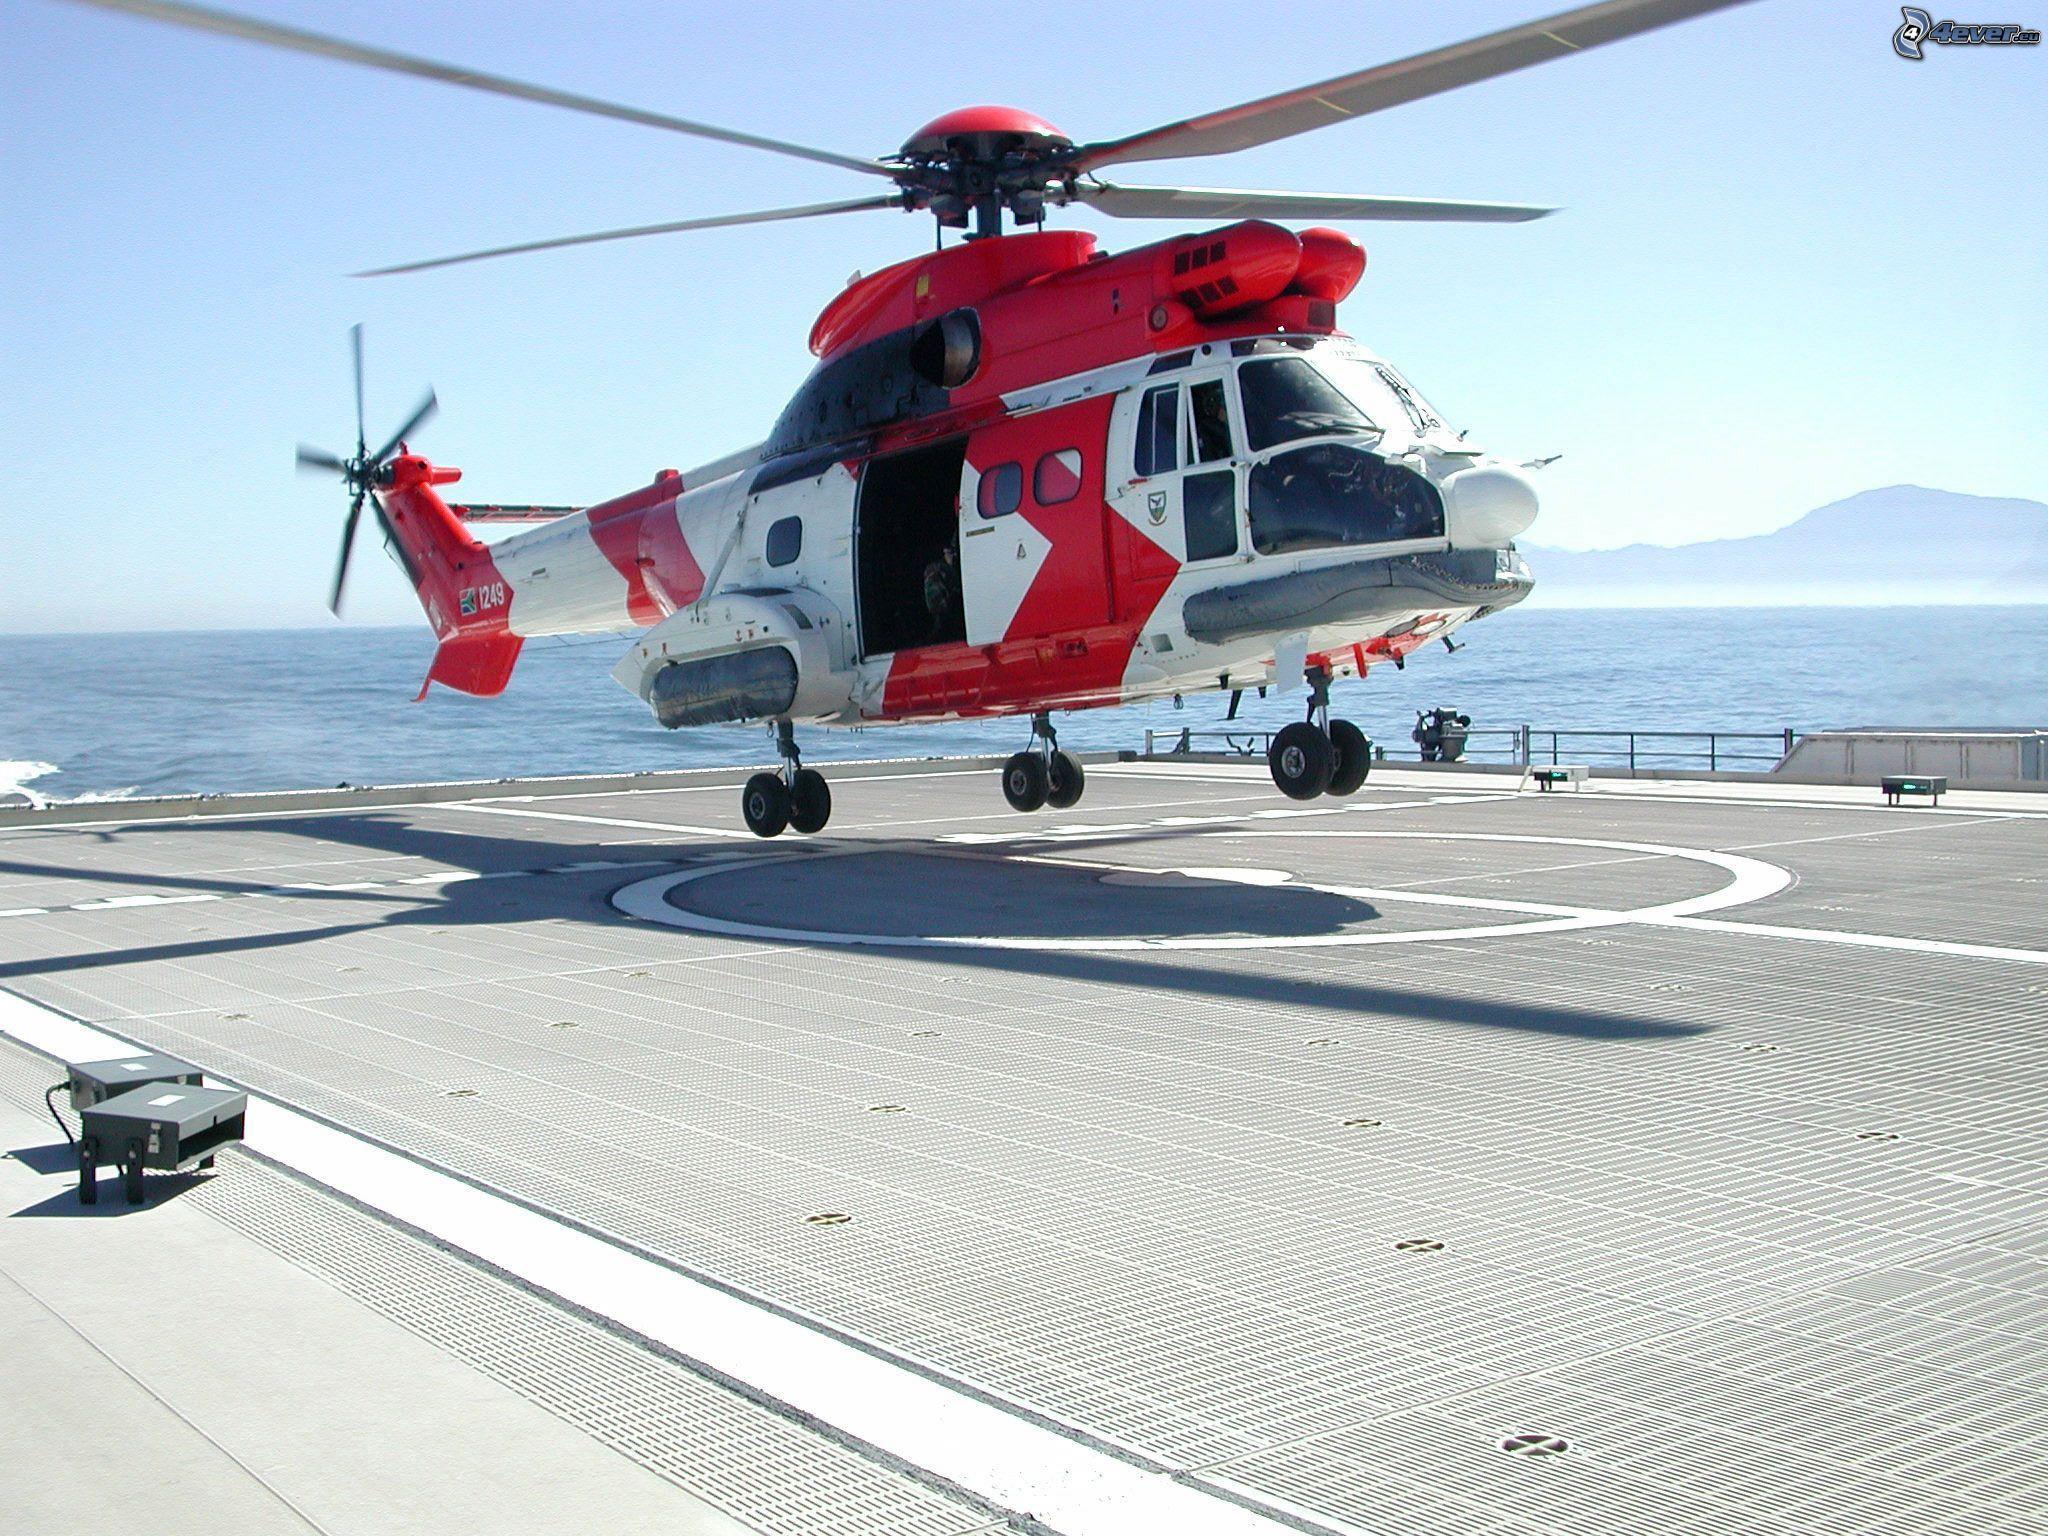 Sauvetage par h licopt re for Porte helicoptere